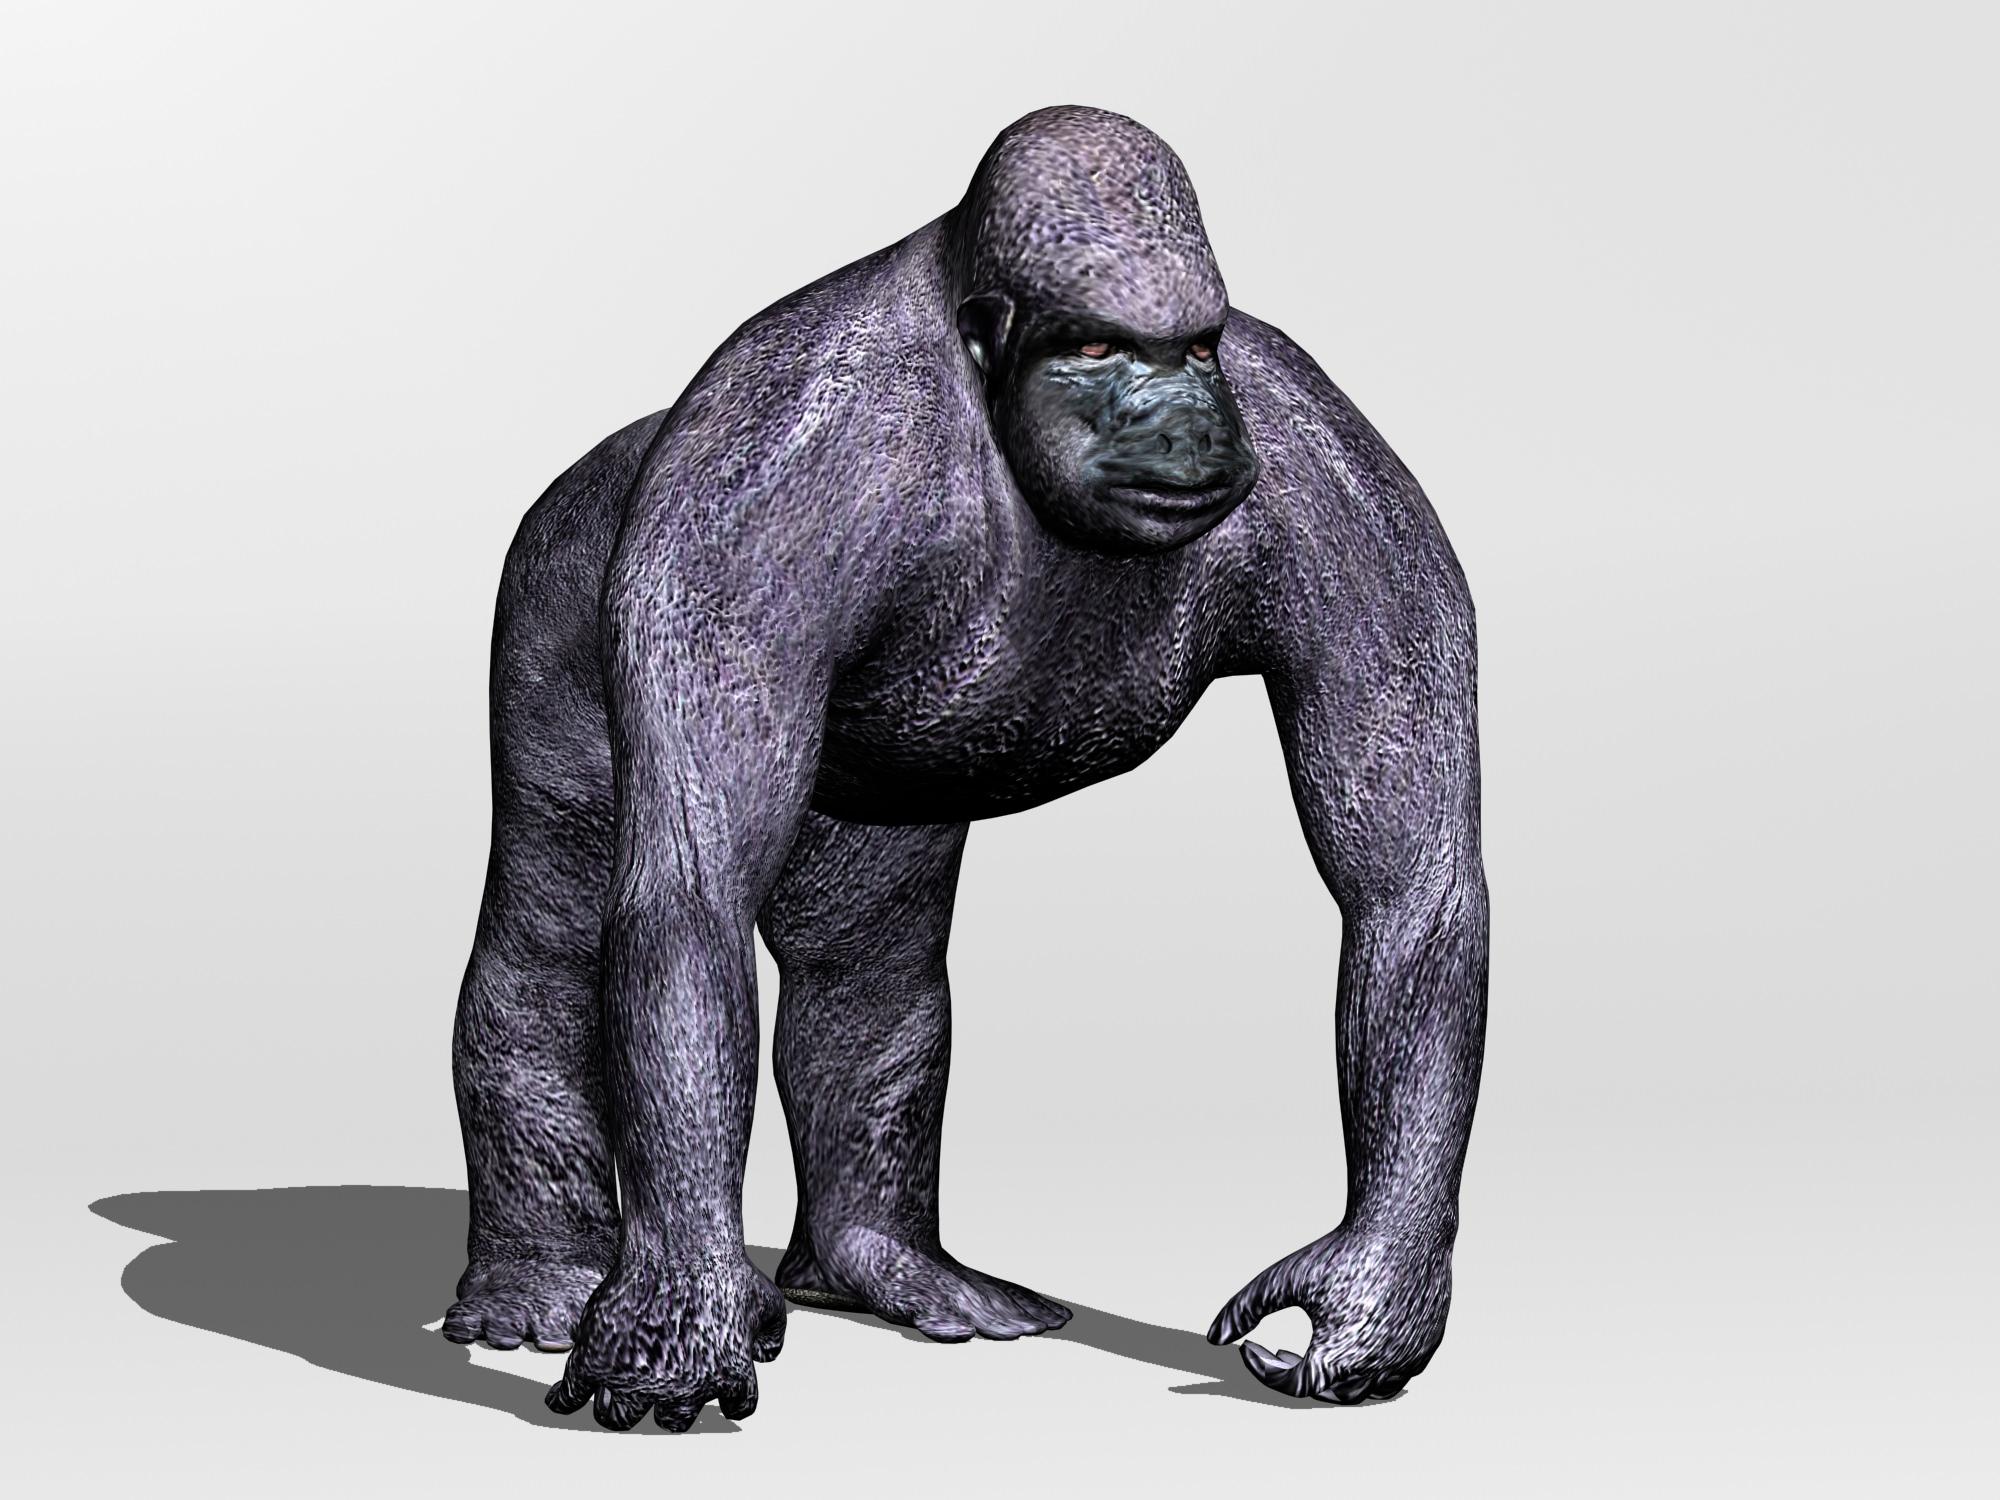 Gorilla 3d Model Max Obj 3ds Fbx C4d Blend